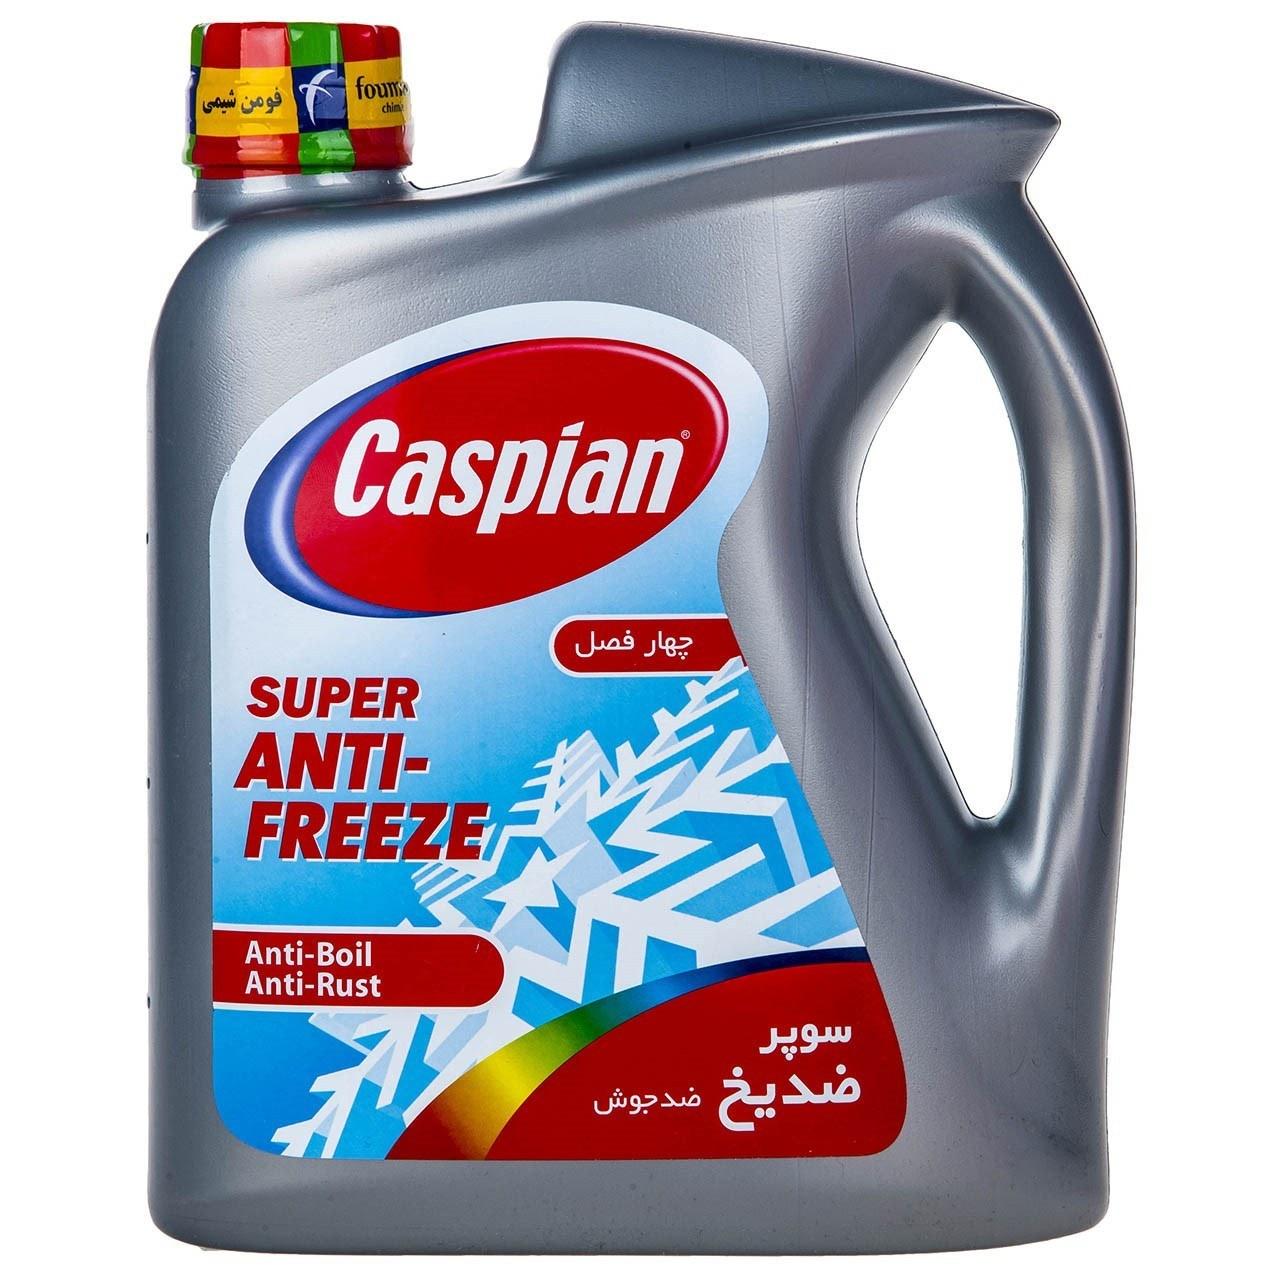 تصویر ضدیخ خودرو کاسپین مدل Super Anti Freeze حجم 3.55 لیتر